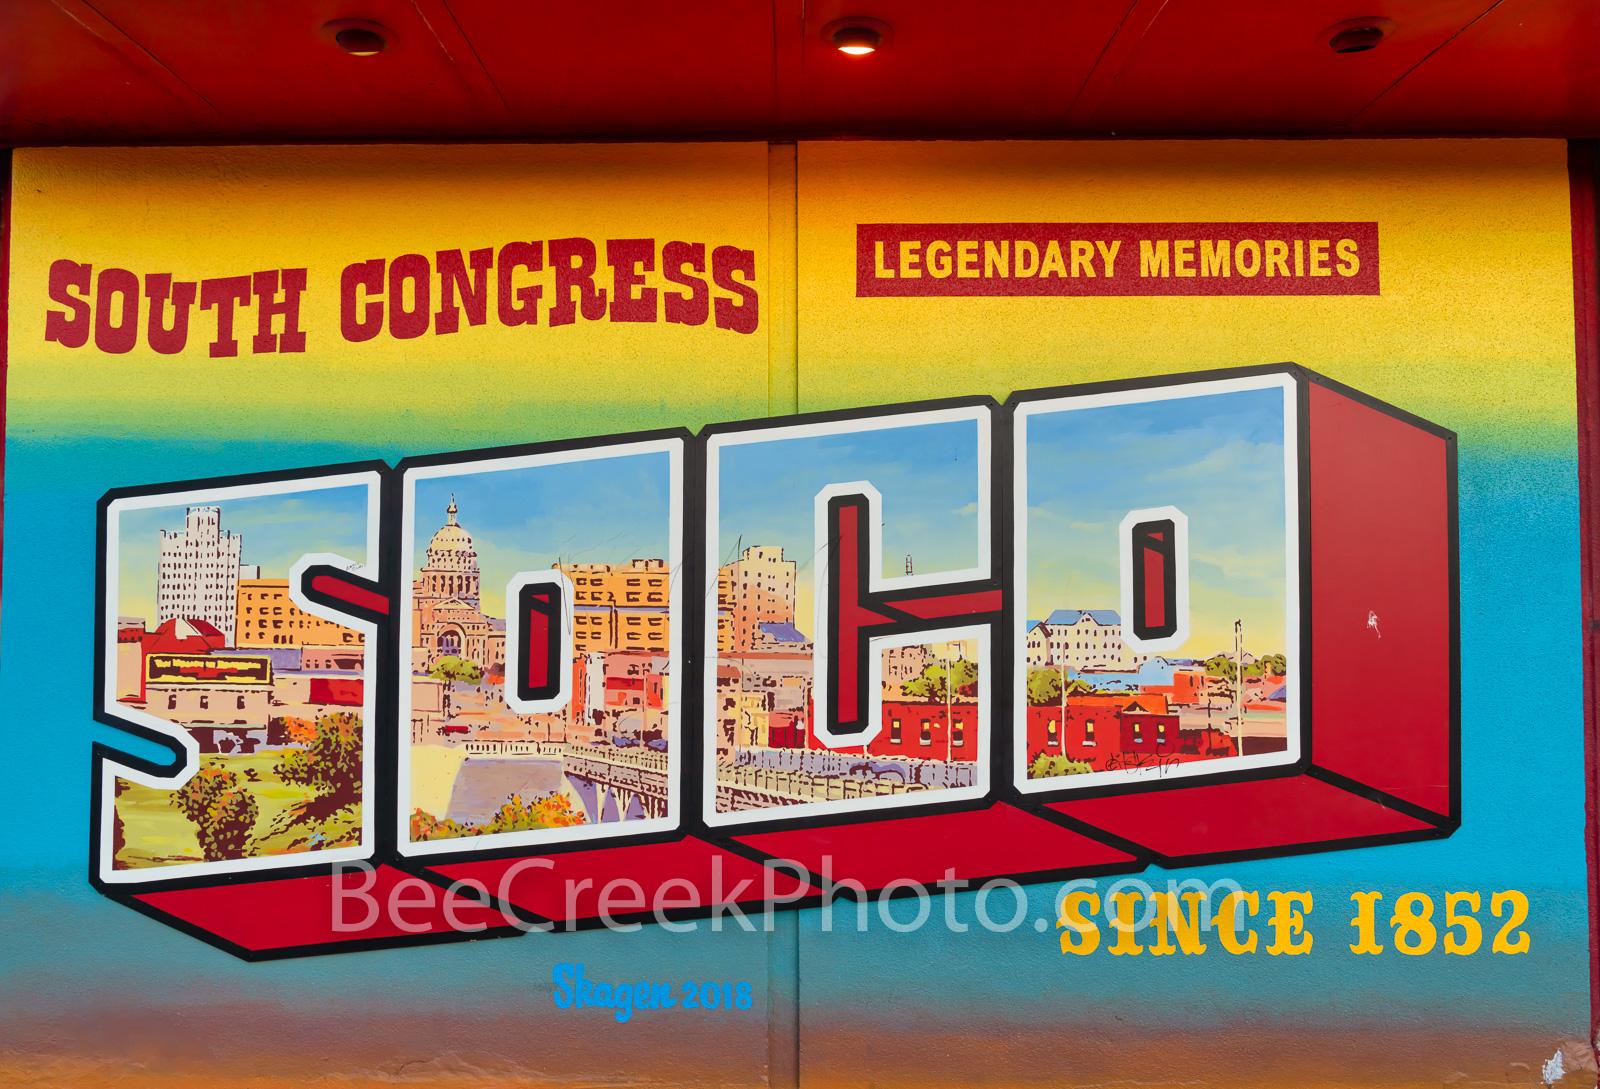 austin, austin texas, downtown  austin, south congress, soco, soco mural, trendy, music, shops, dinning, mural, austin murals, city of austin, hip area, wall mural, street art, downtown austin, austin, photo